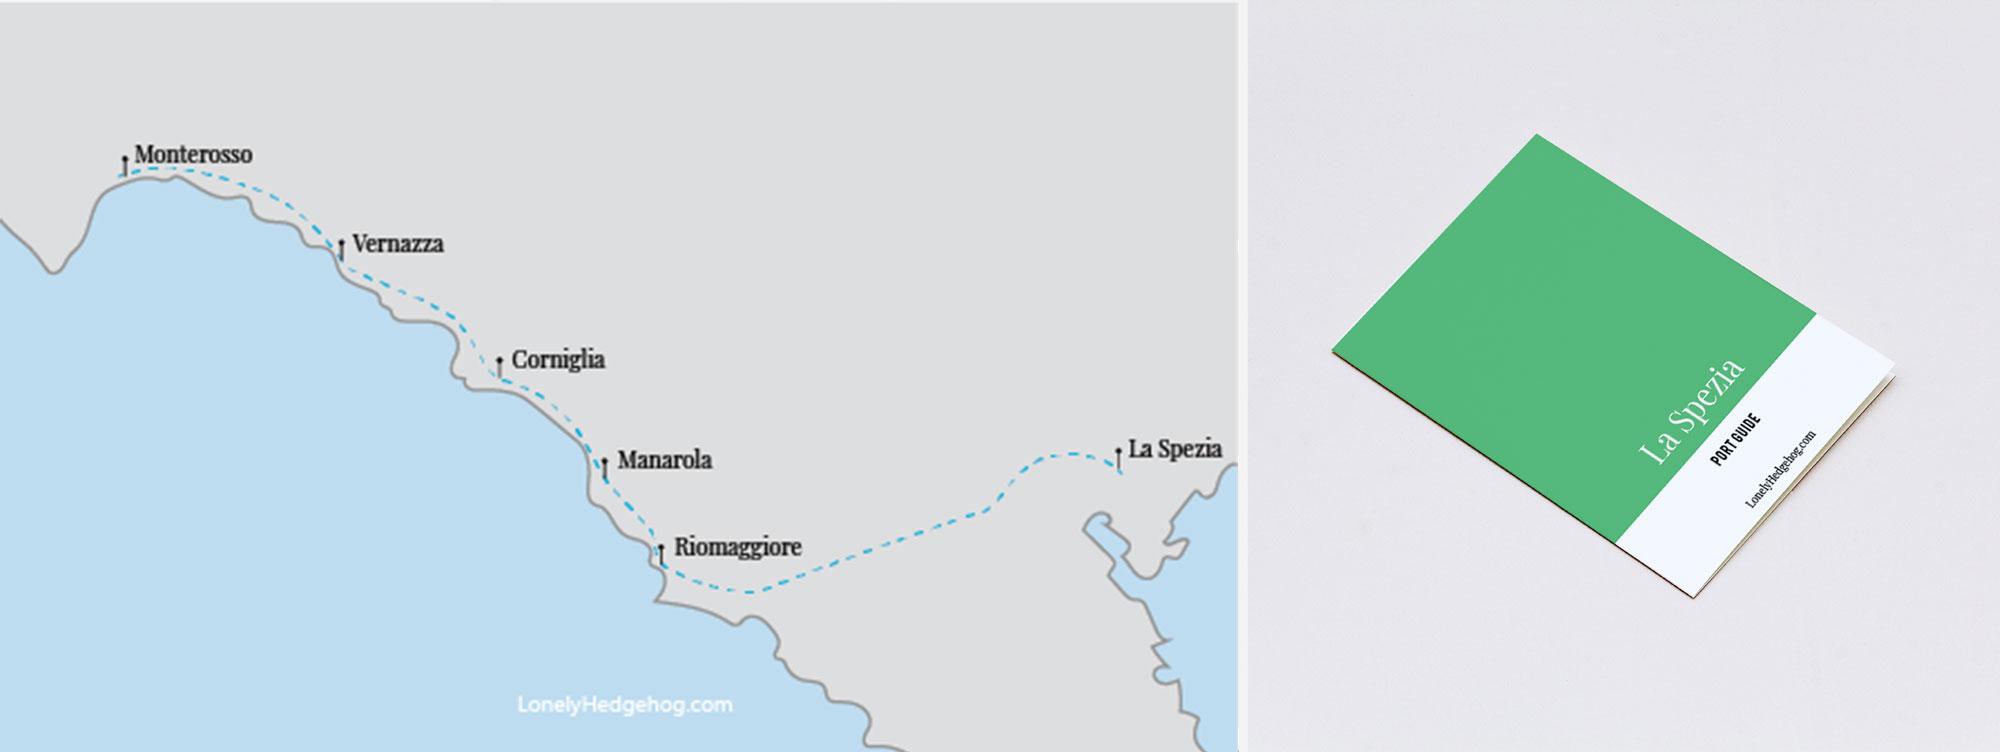 The Essential La Spezia Cruise Port Guide With Printable Maps